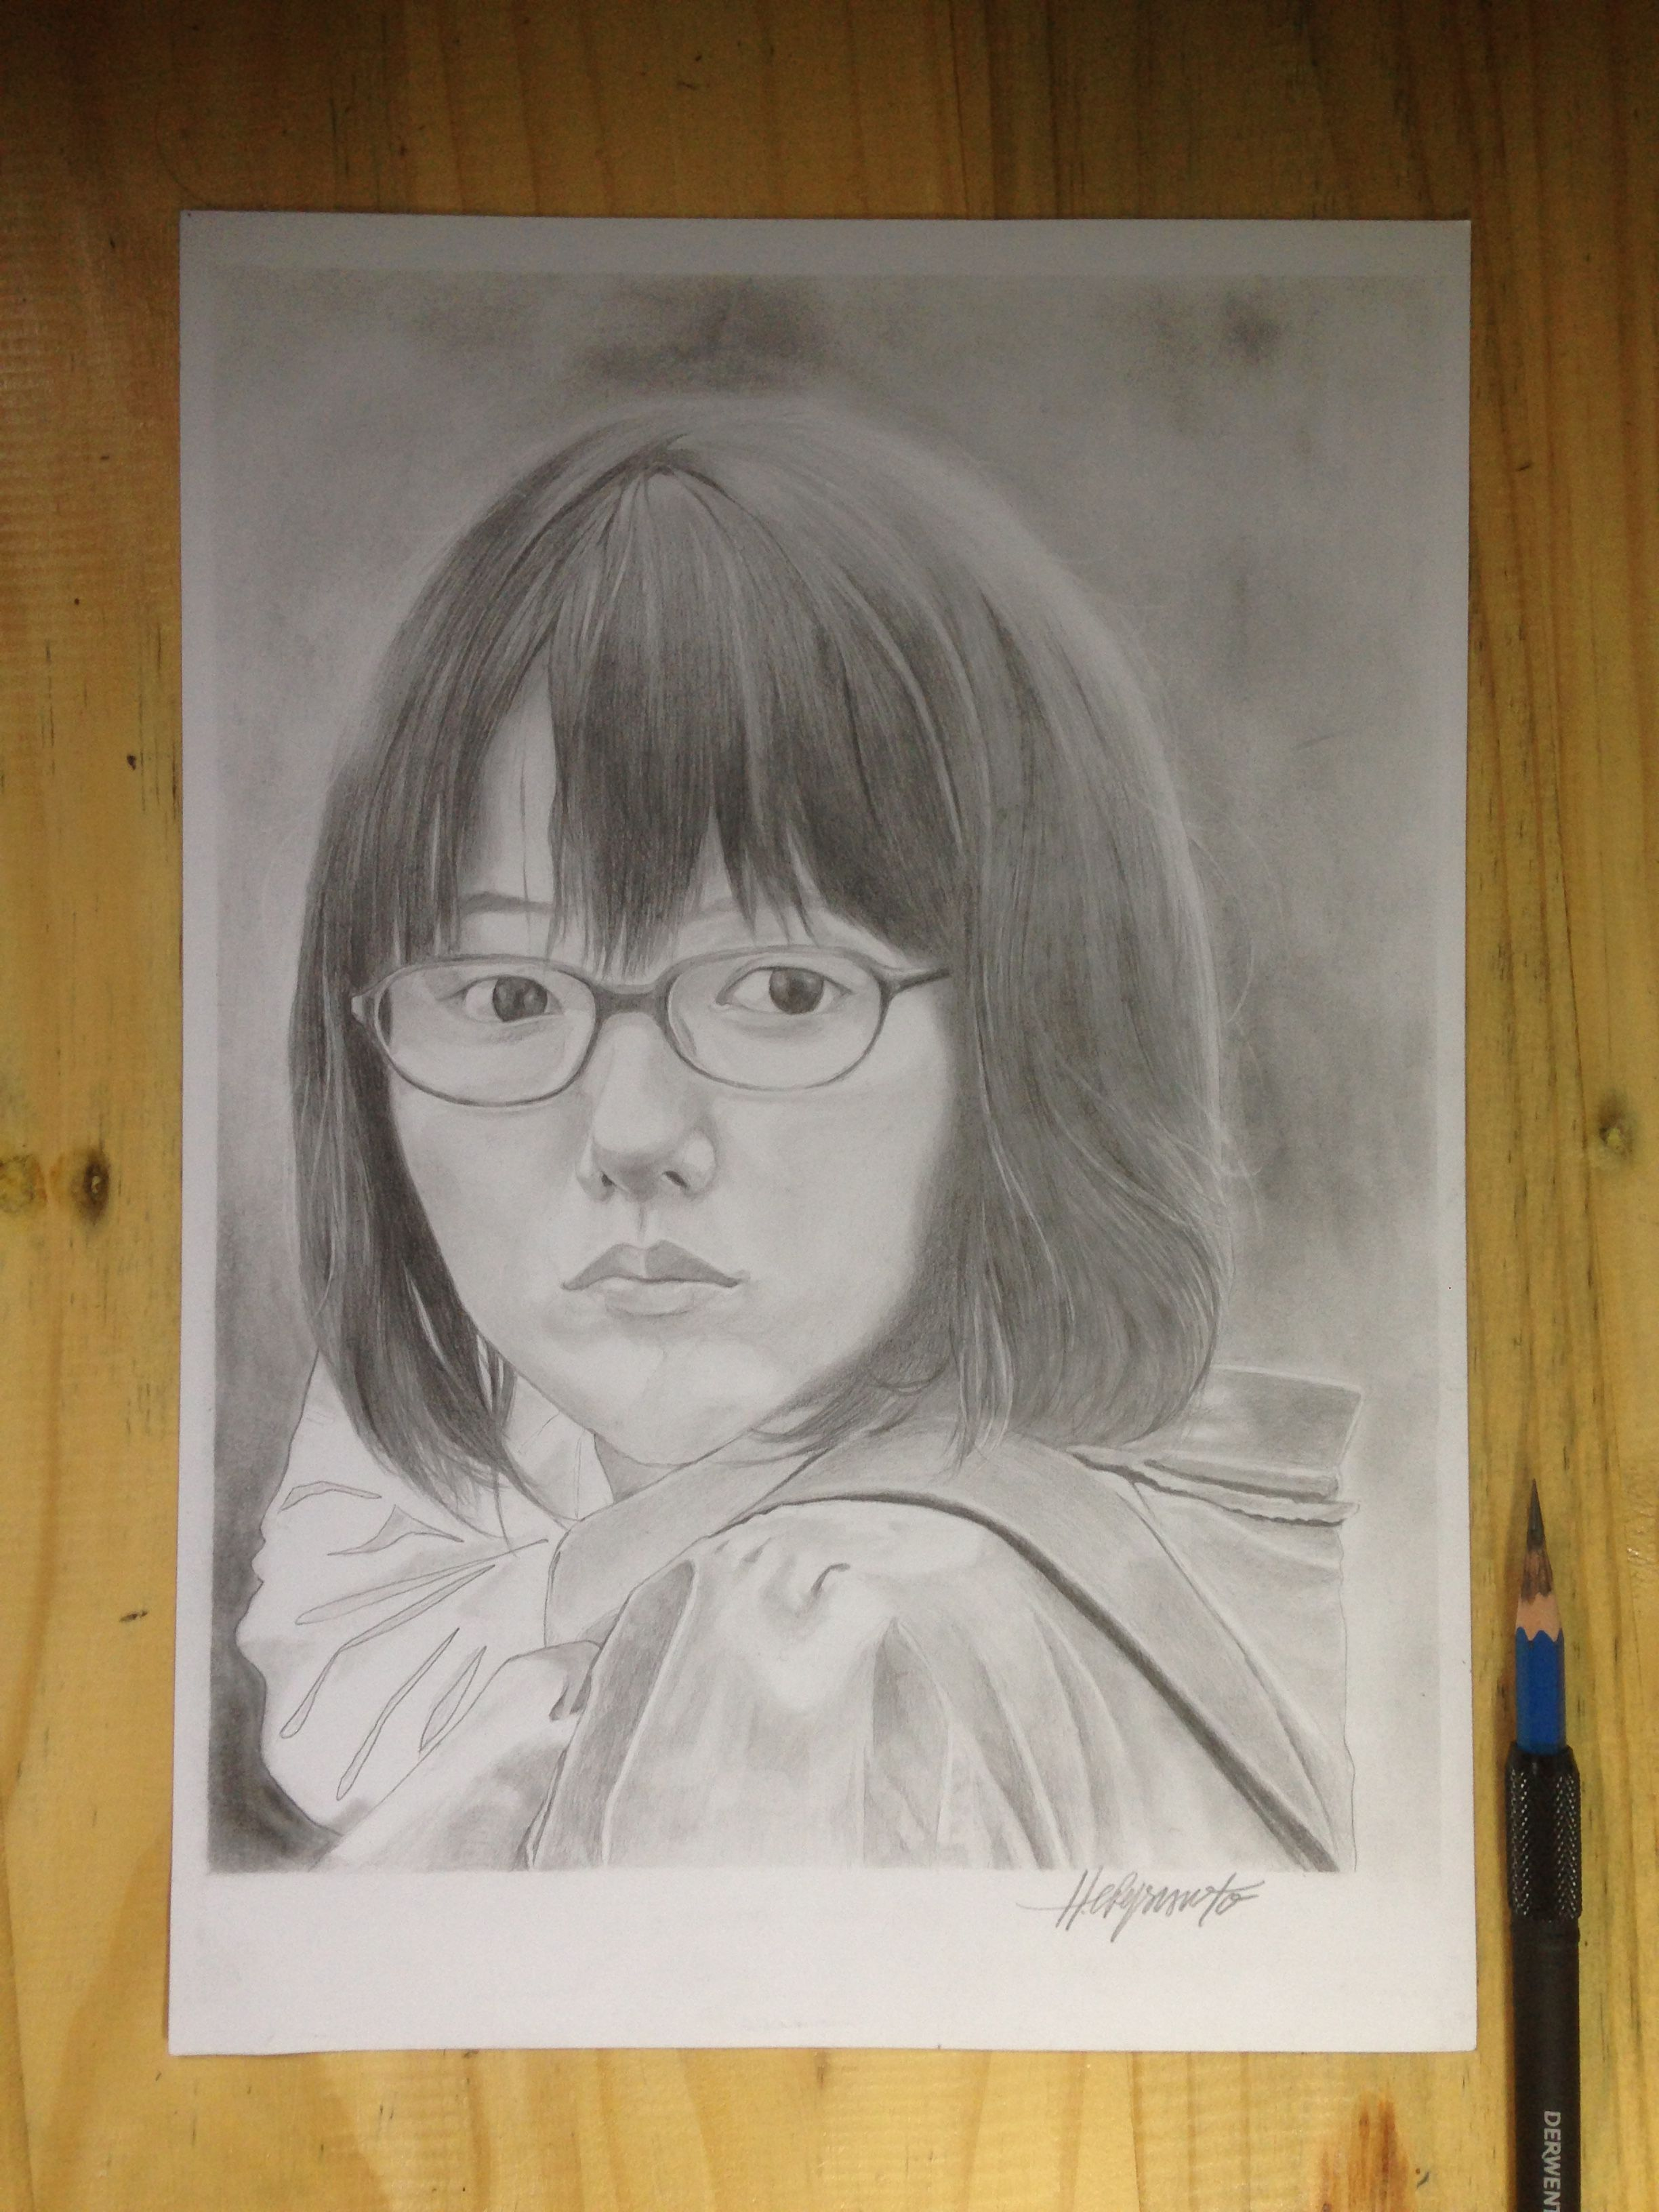 Aoimiyazaki artist sketch pencil drawing